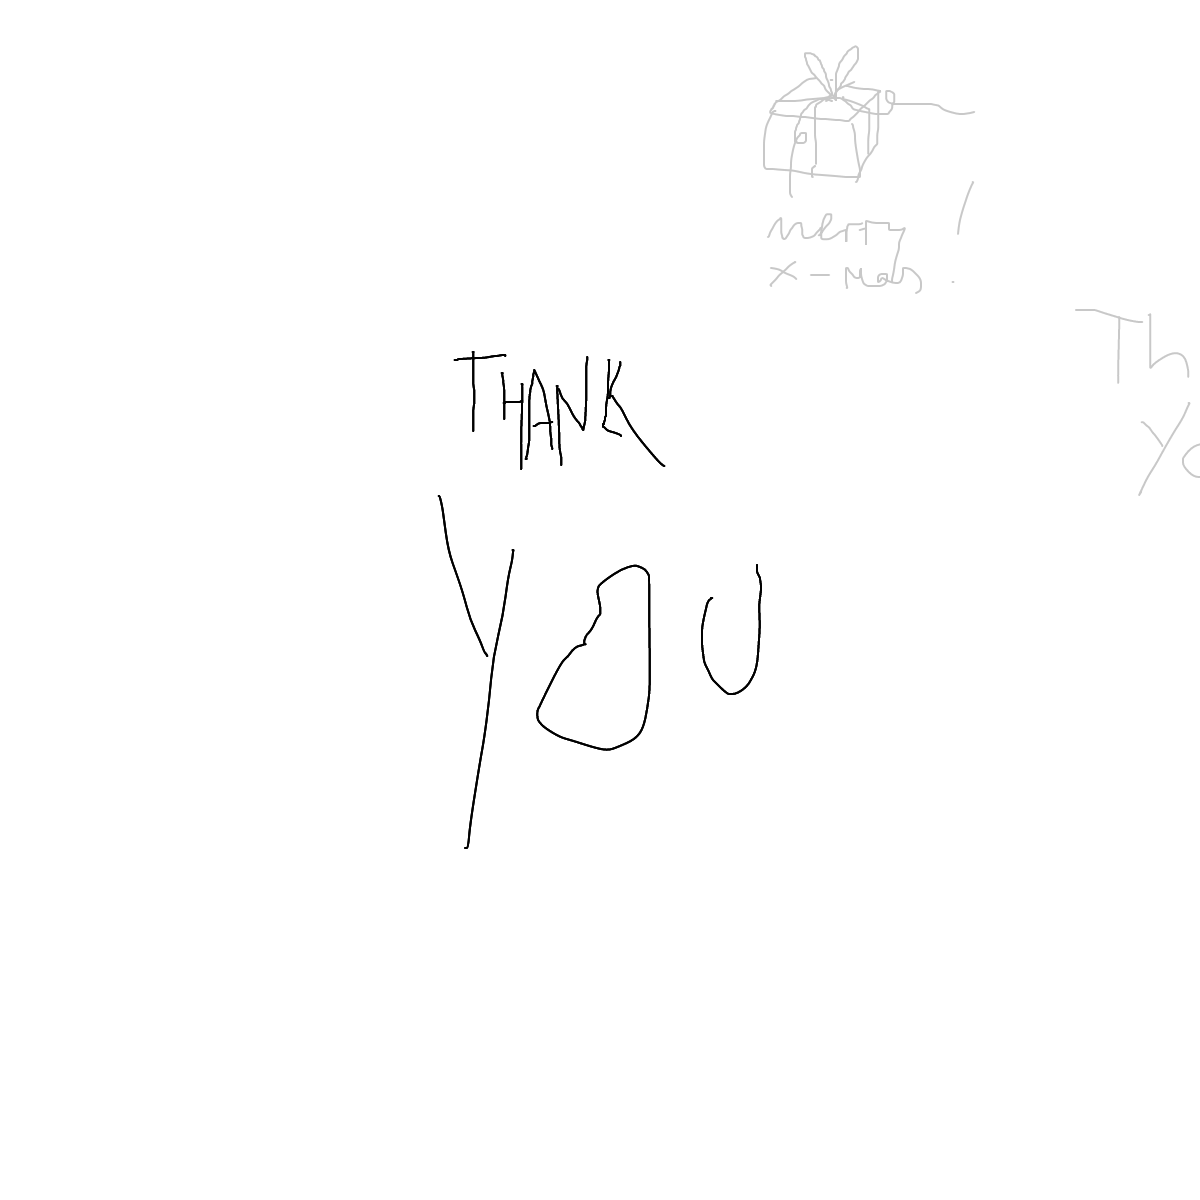 BAAAM drawing#23511 lat:48.1286392211914060lng: 11.6001081466674800